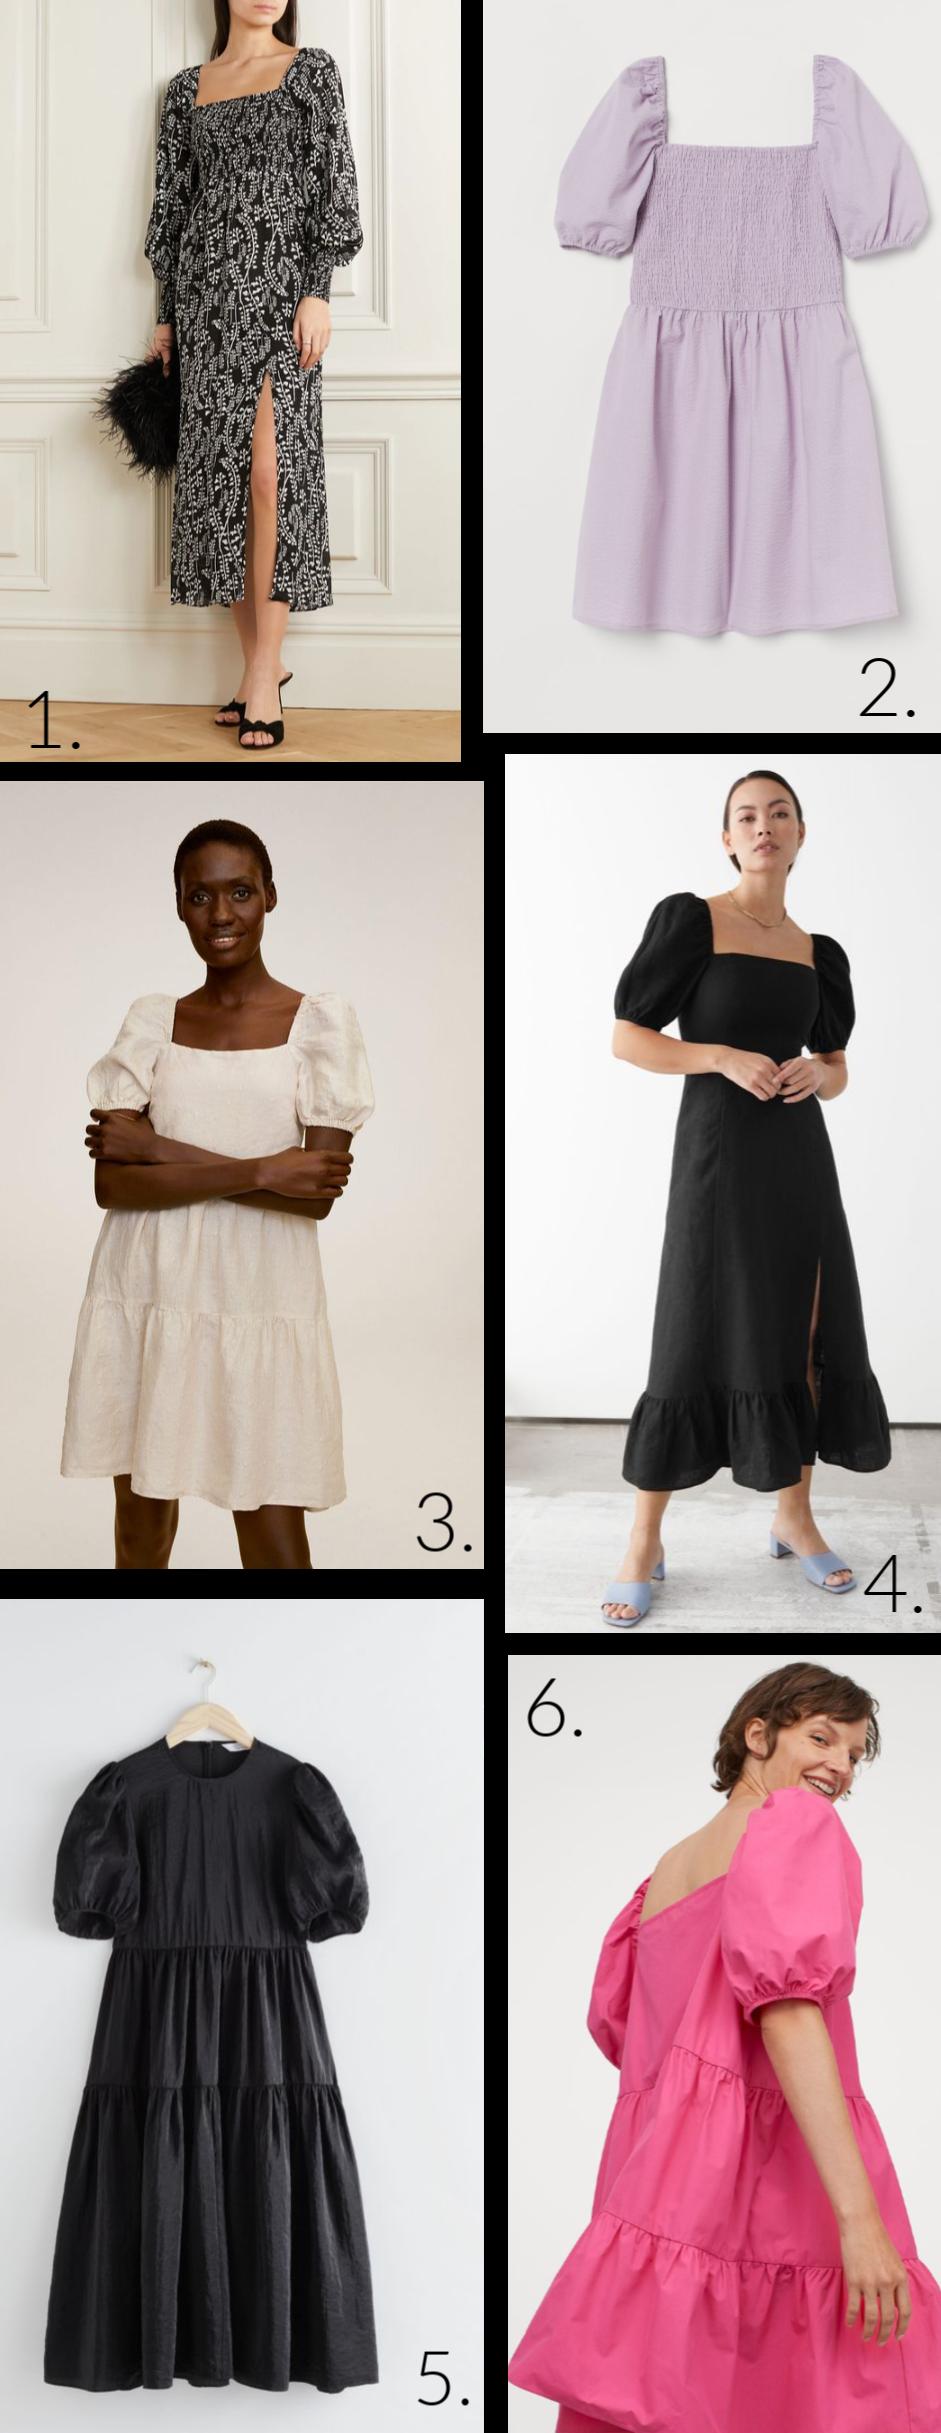 Wednesday Wishlist: Puff-Sleeved Dresses